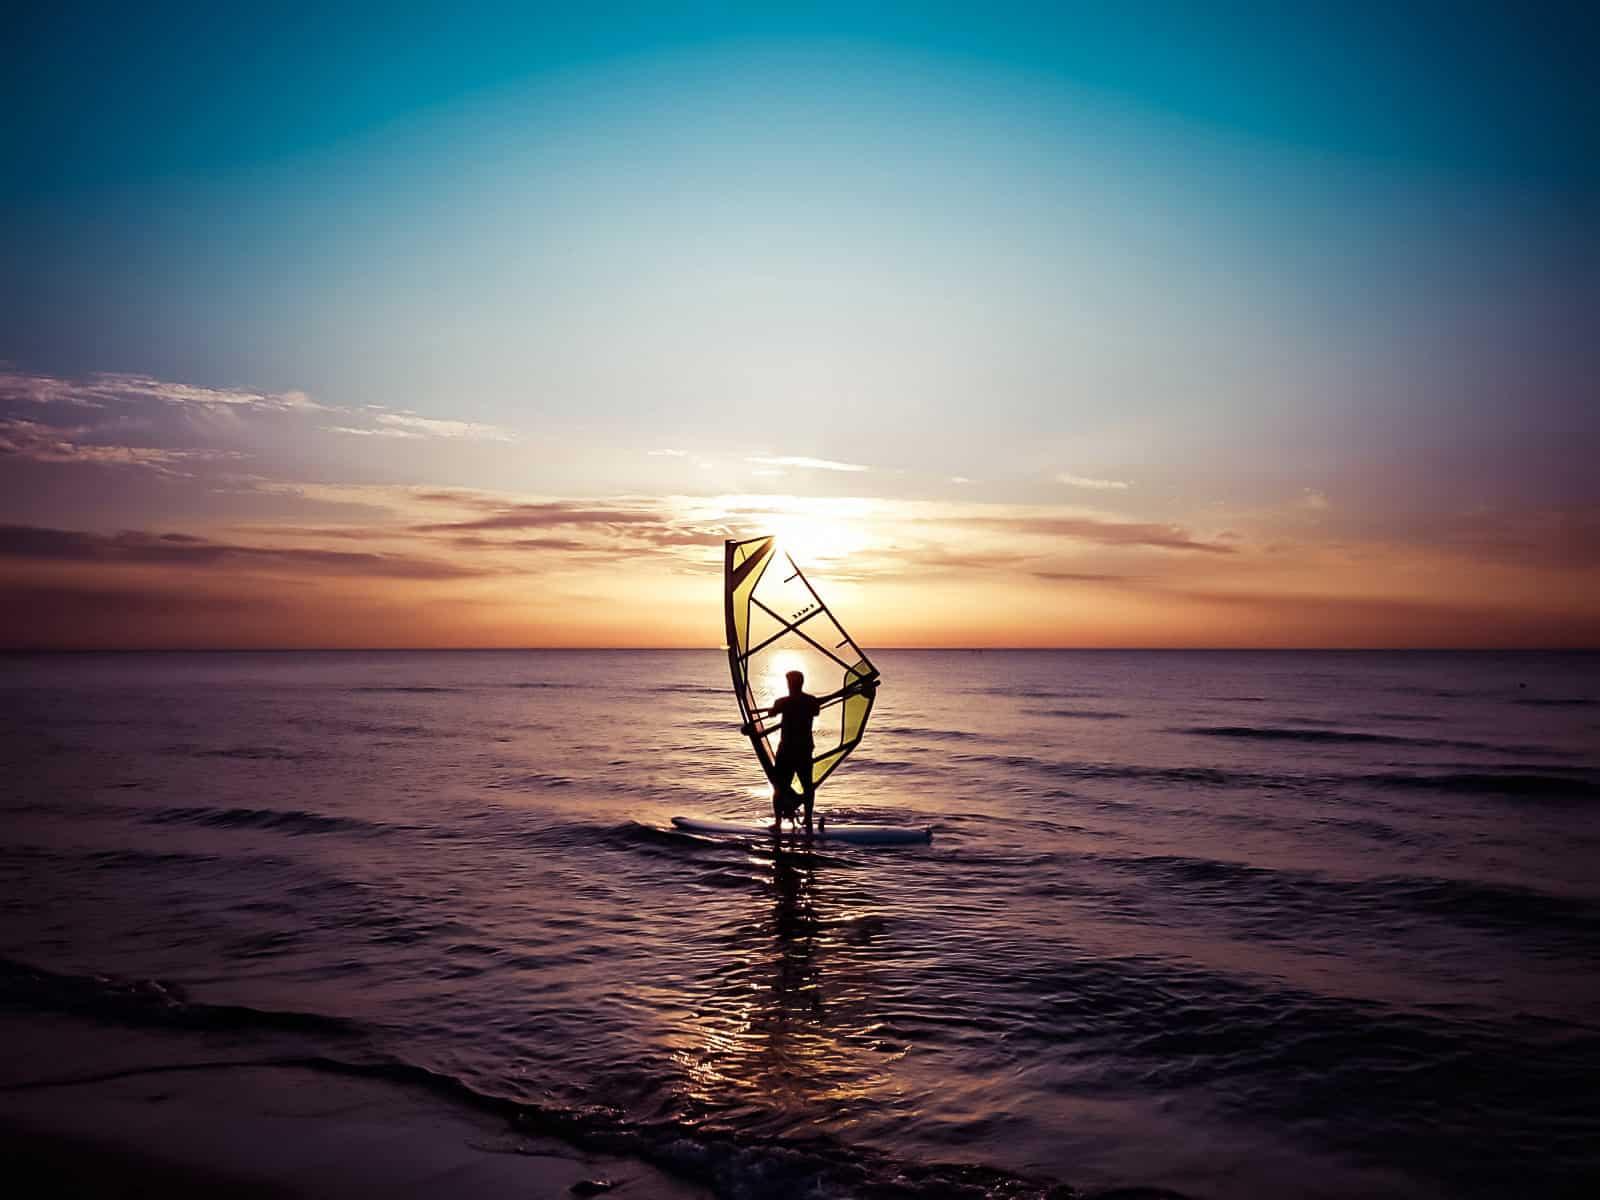 Windsurfkurs Ostsee Sonnenuntergang